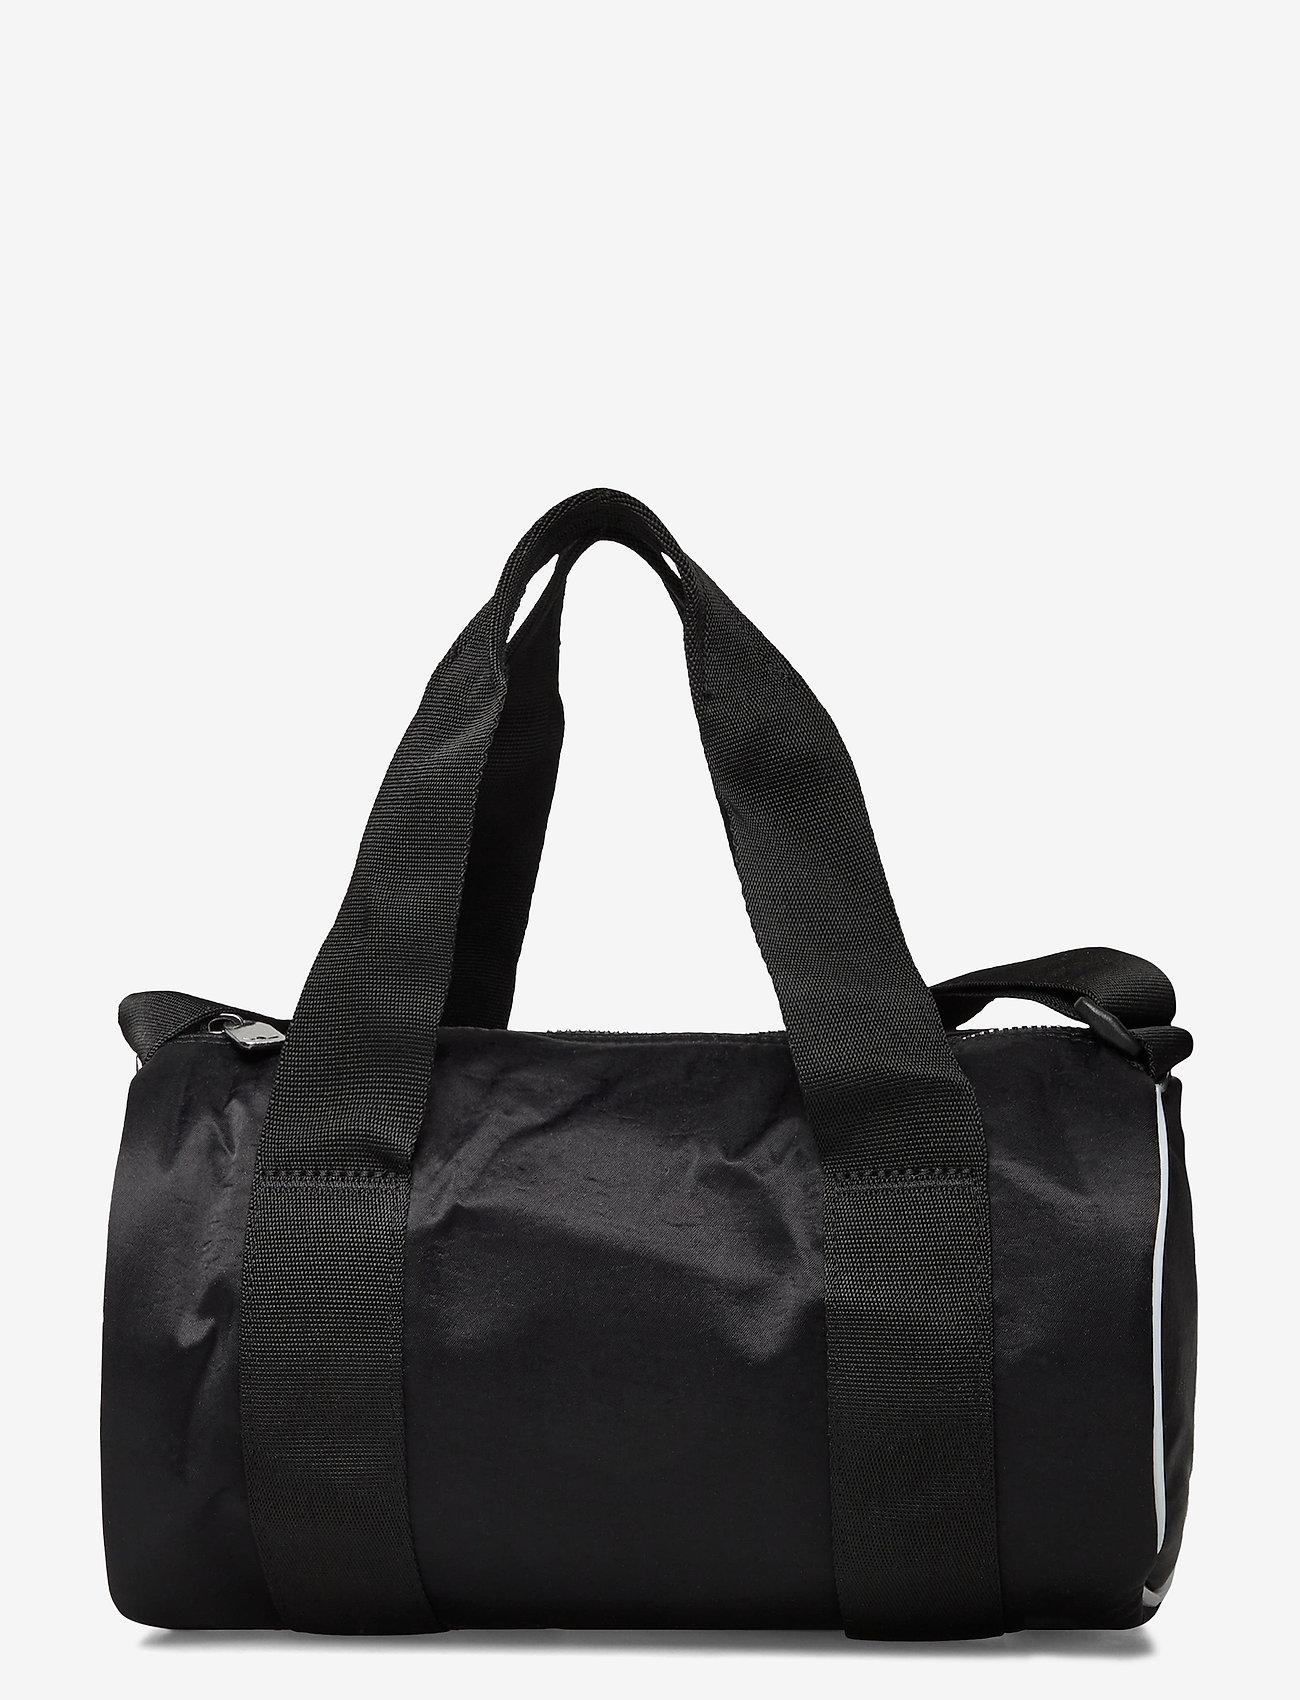 adidas Originals - MINI D NYLON - gymtassen - black - 1